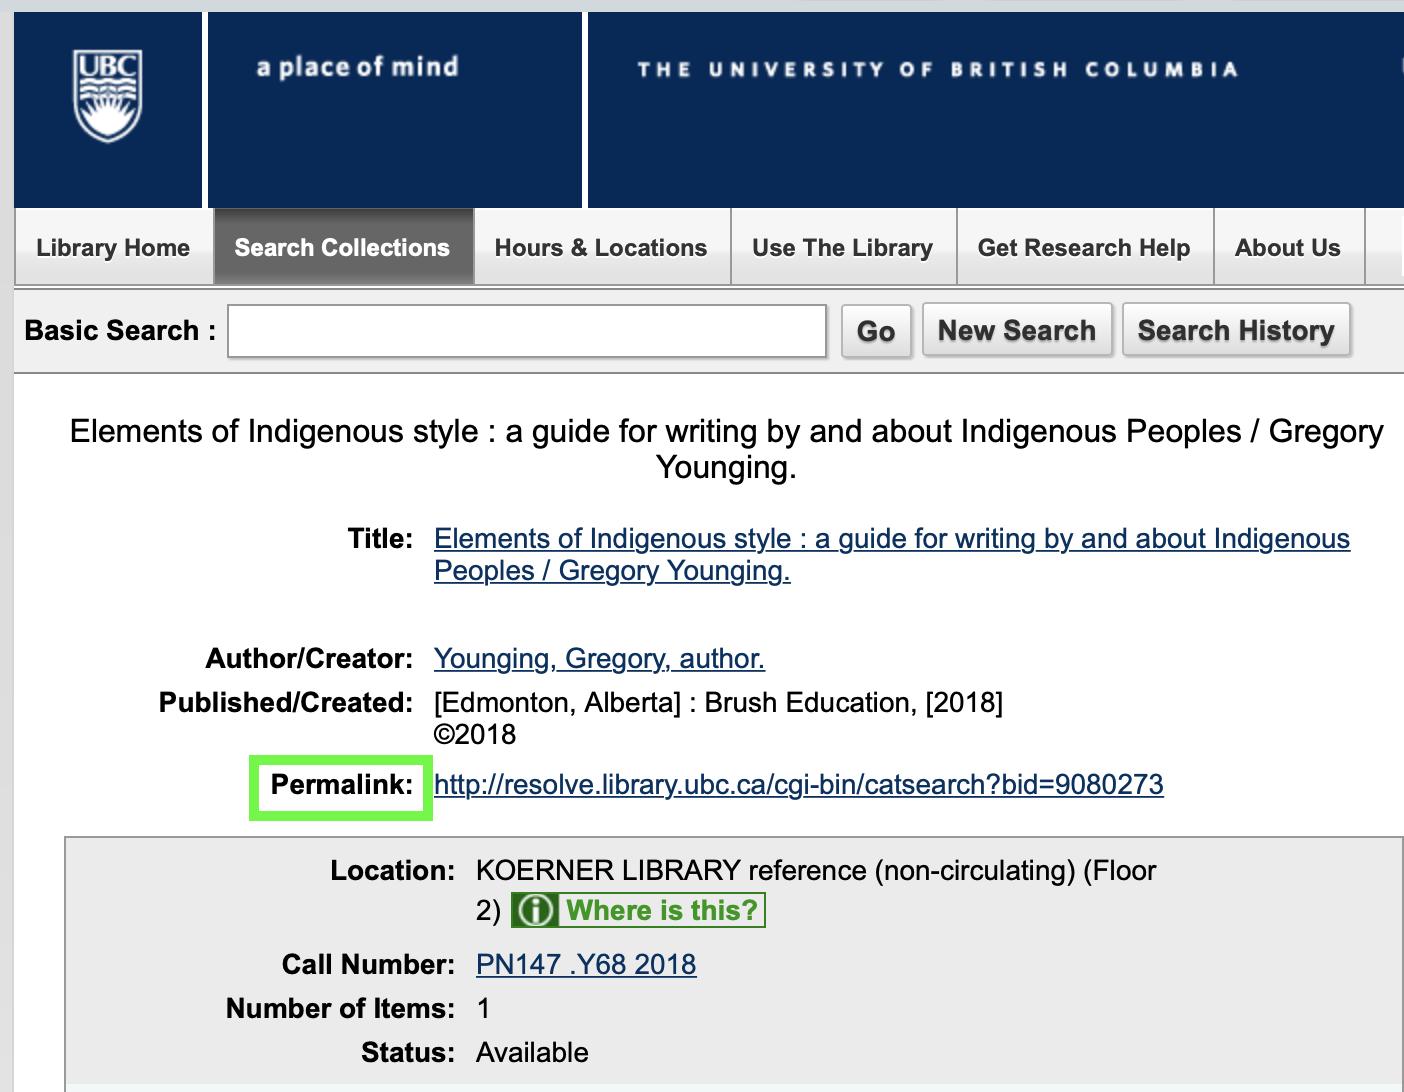 UBC Library catalogue screenshot indicating location of permanent URL